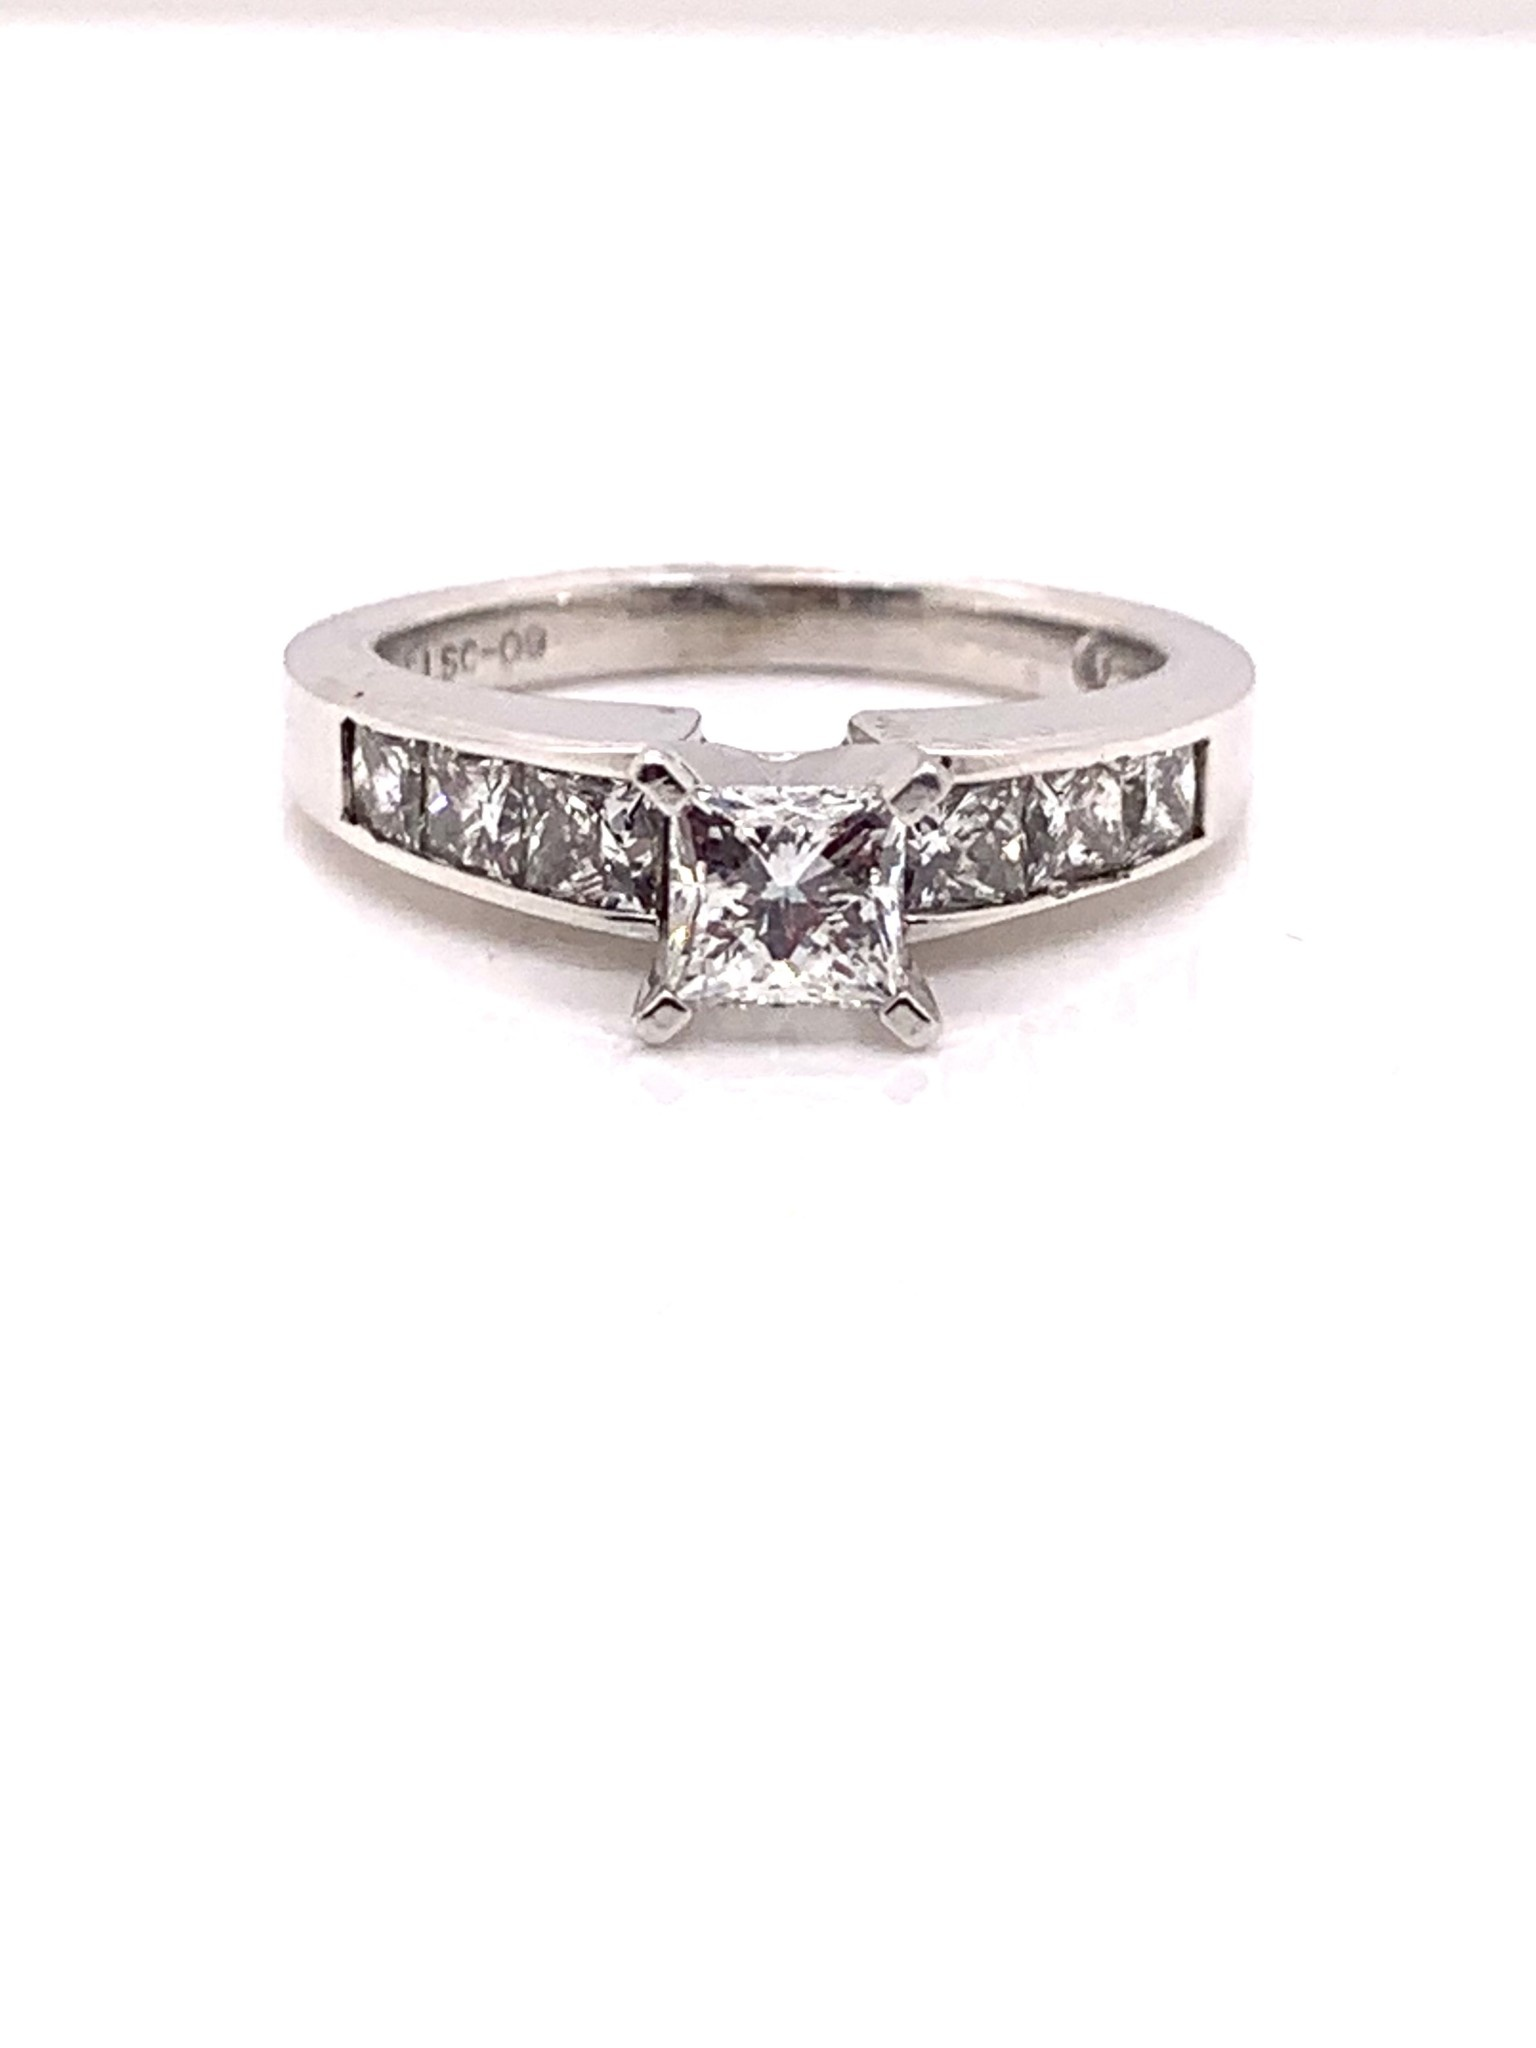 Platinum 0.59ct princess cut engagement ring G, VS1